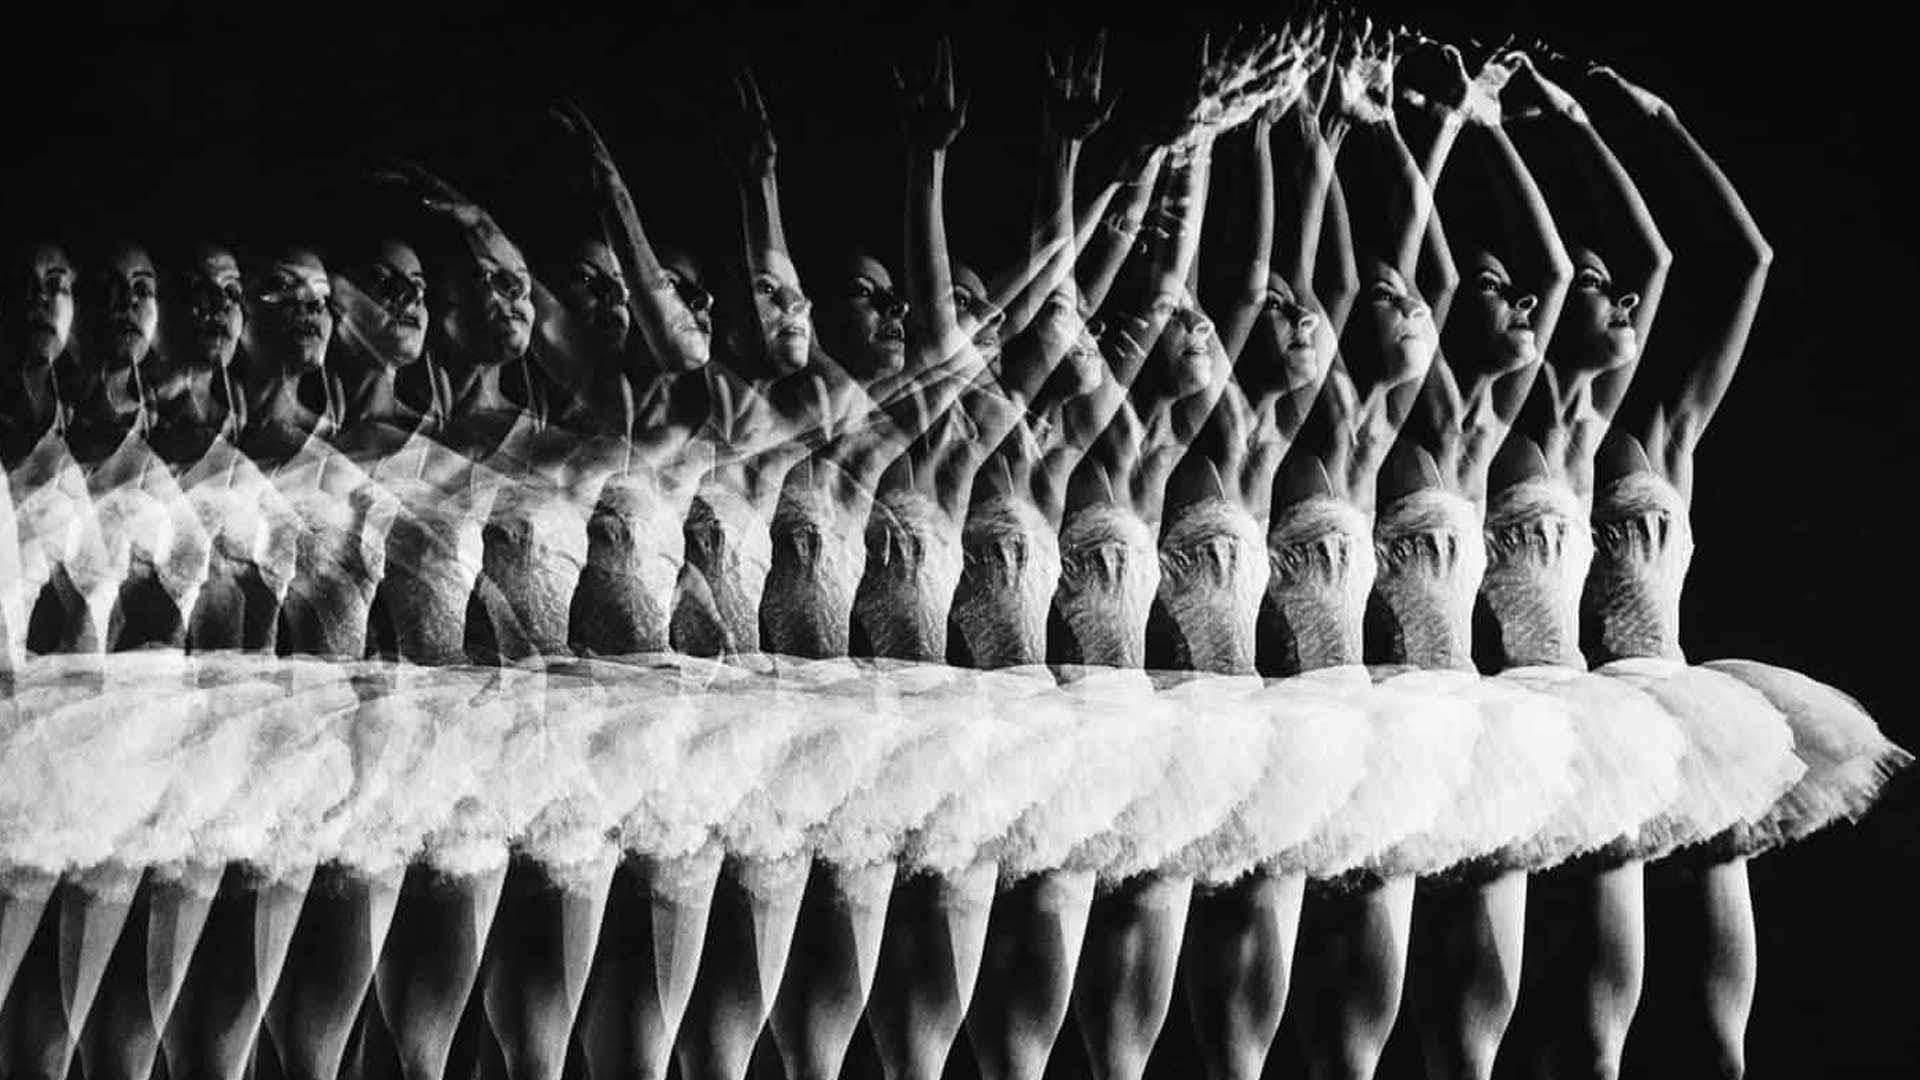 gjon-mili-Ballerina-Alicia-Alonso-doing-a-pas-de-bourree-1944-